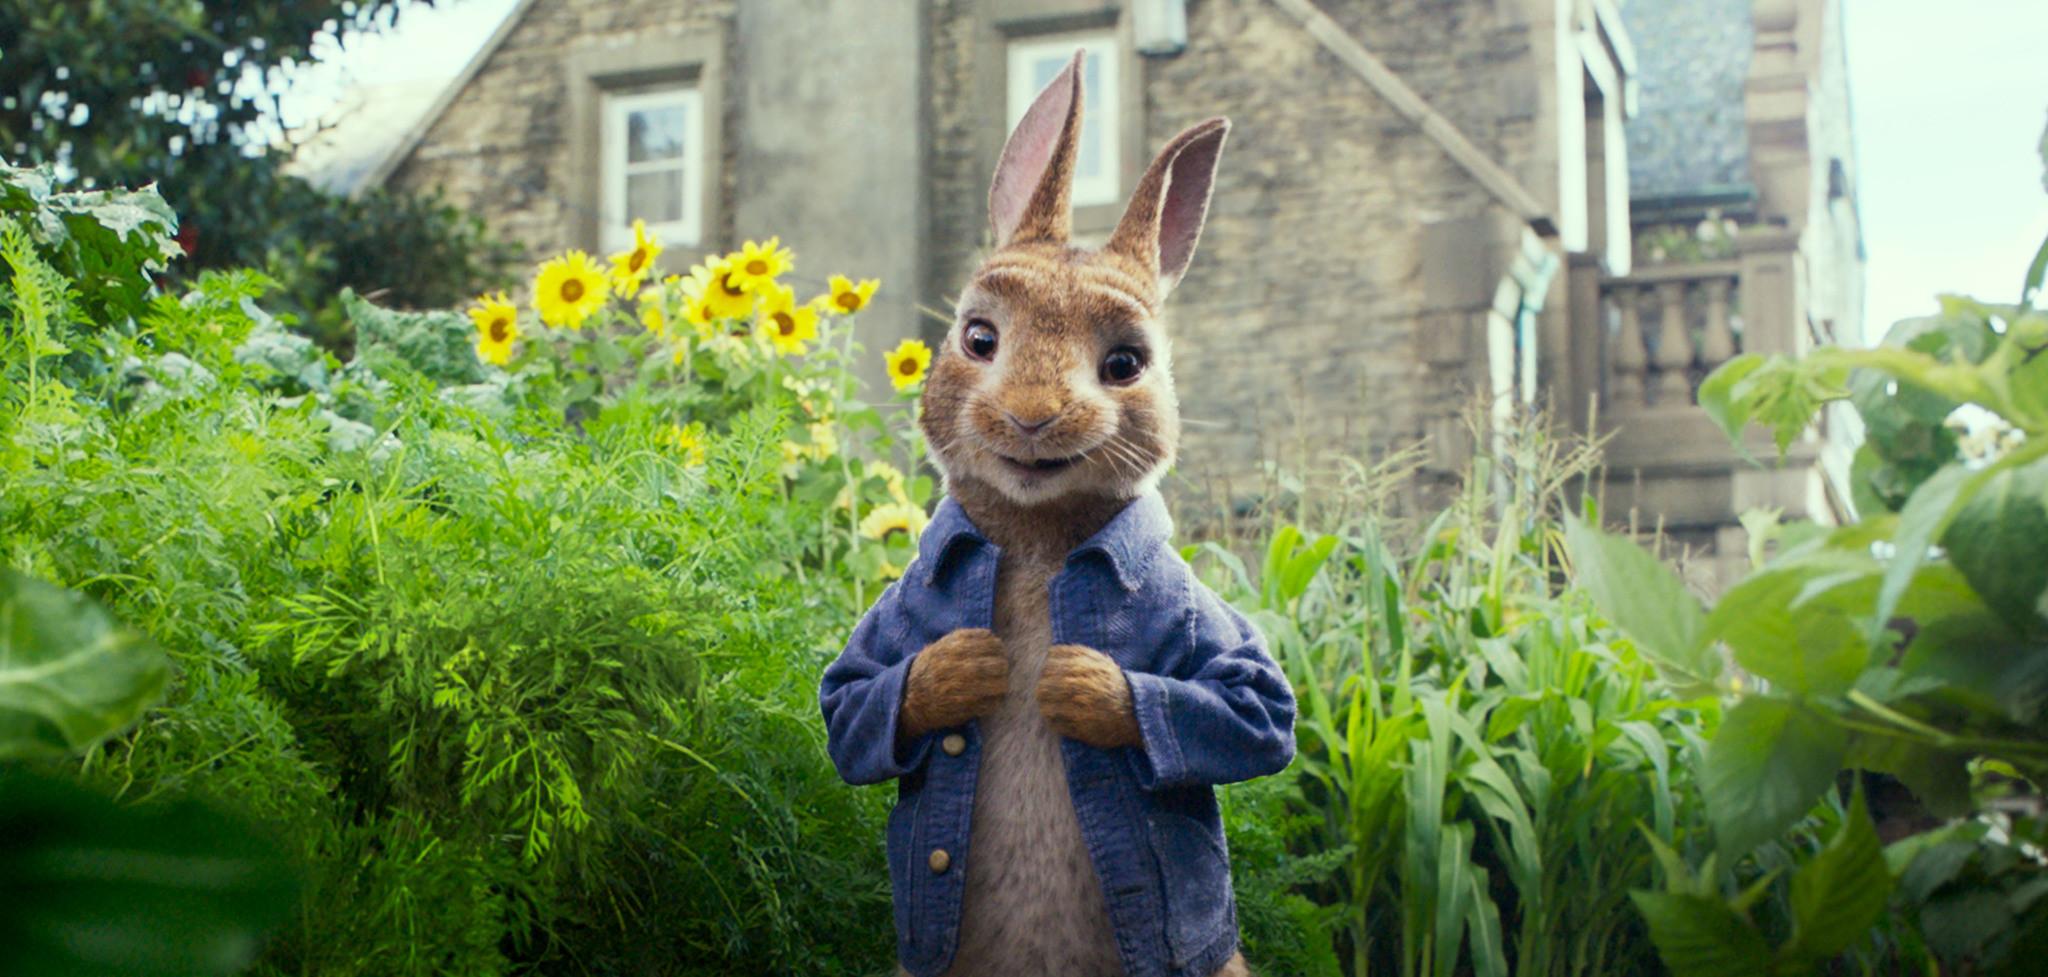 peter rabbit3.jpg